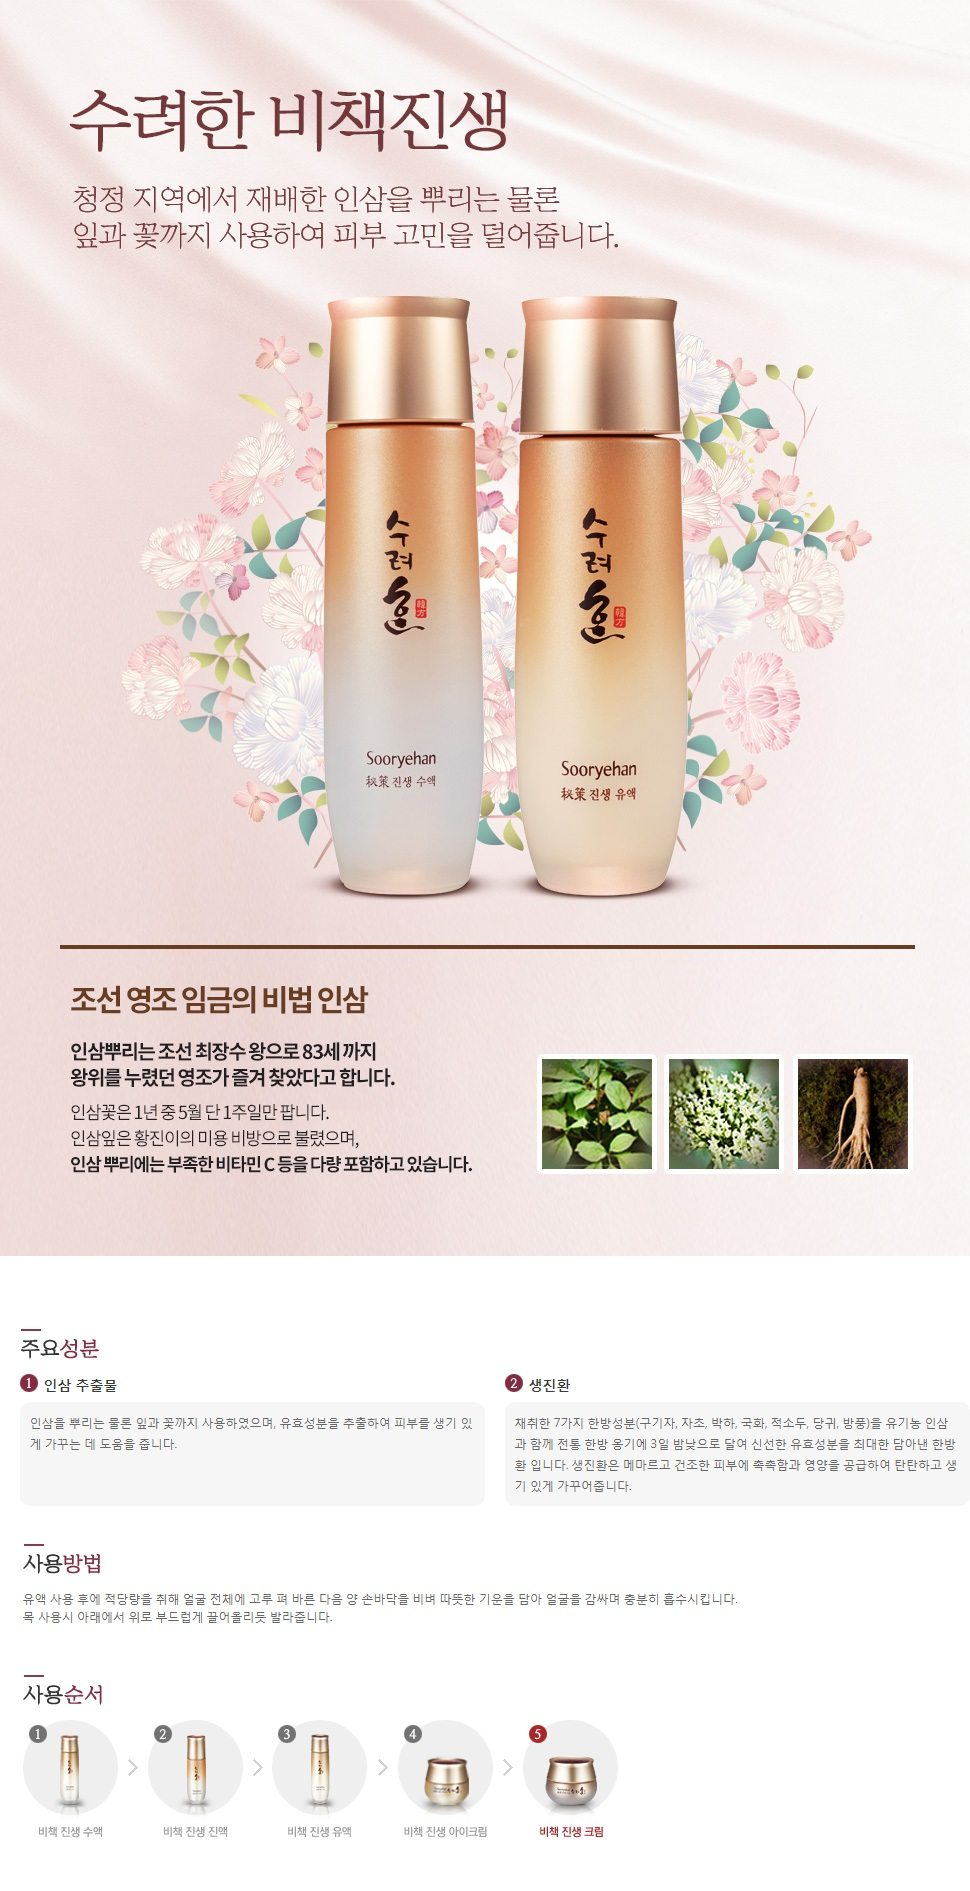 Sooryehan Bichaek Ginseng Cream 50ml malaysia singapore indonesia